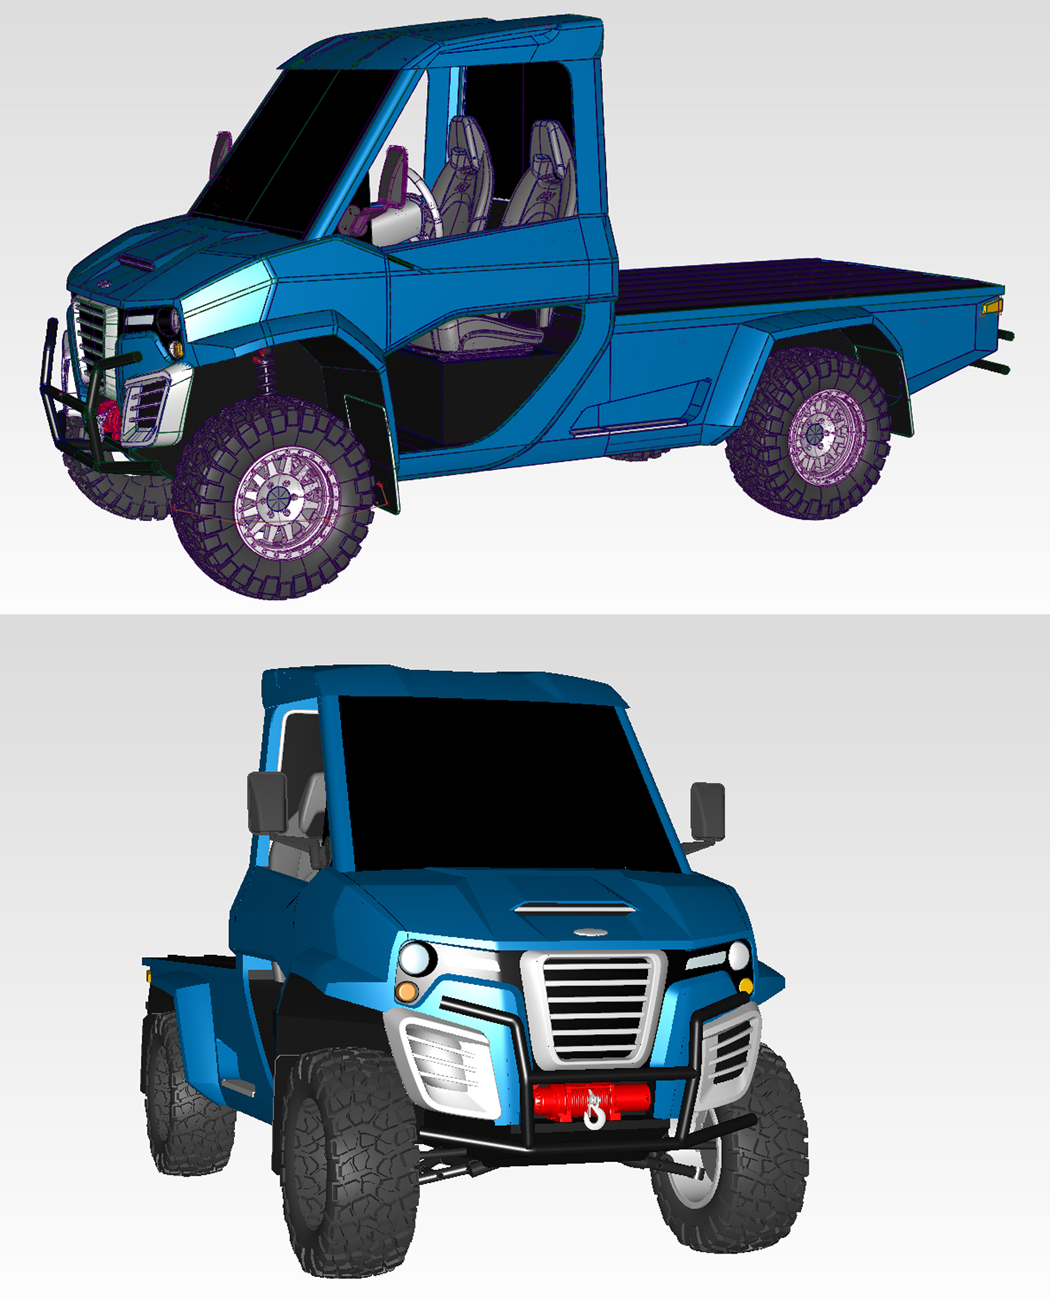 AYRO 511 UTV Keage Concepts Calgary Alberta Automotive Design